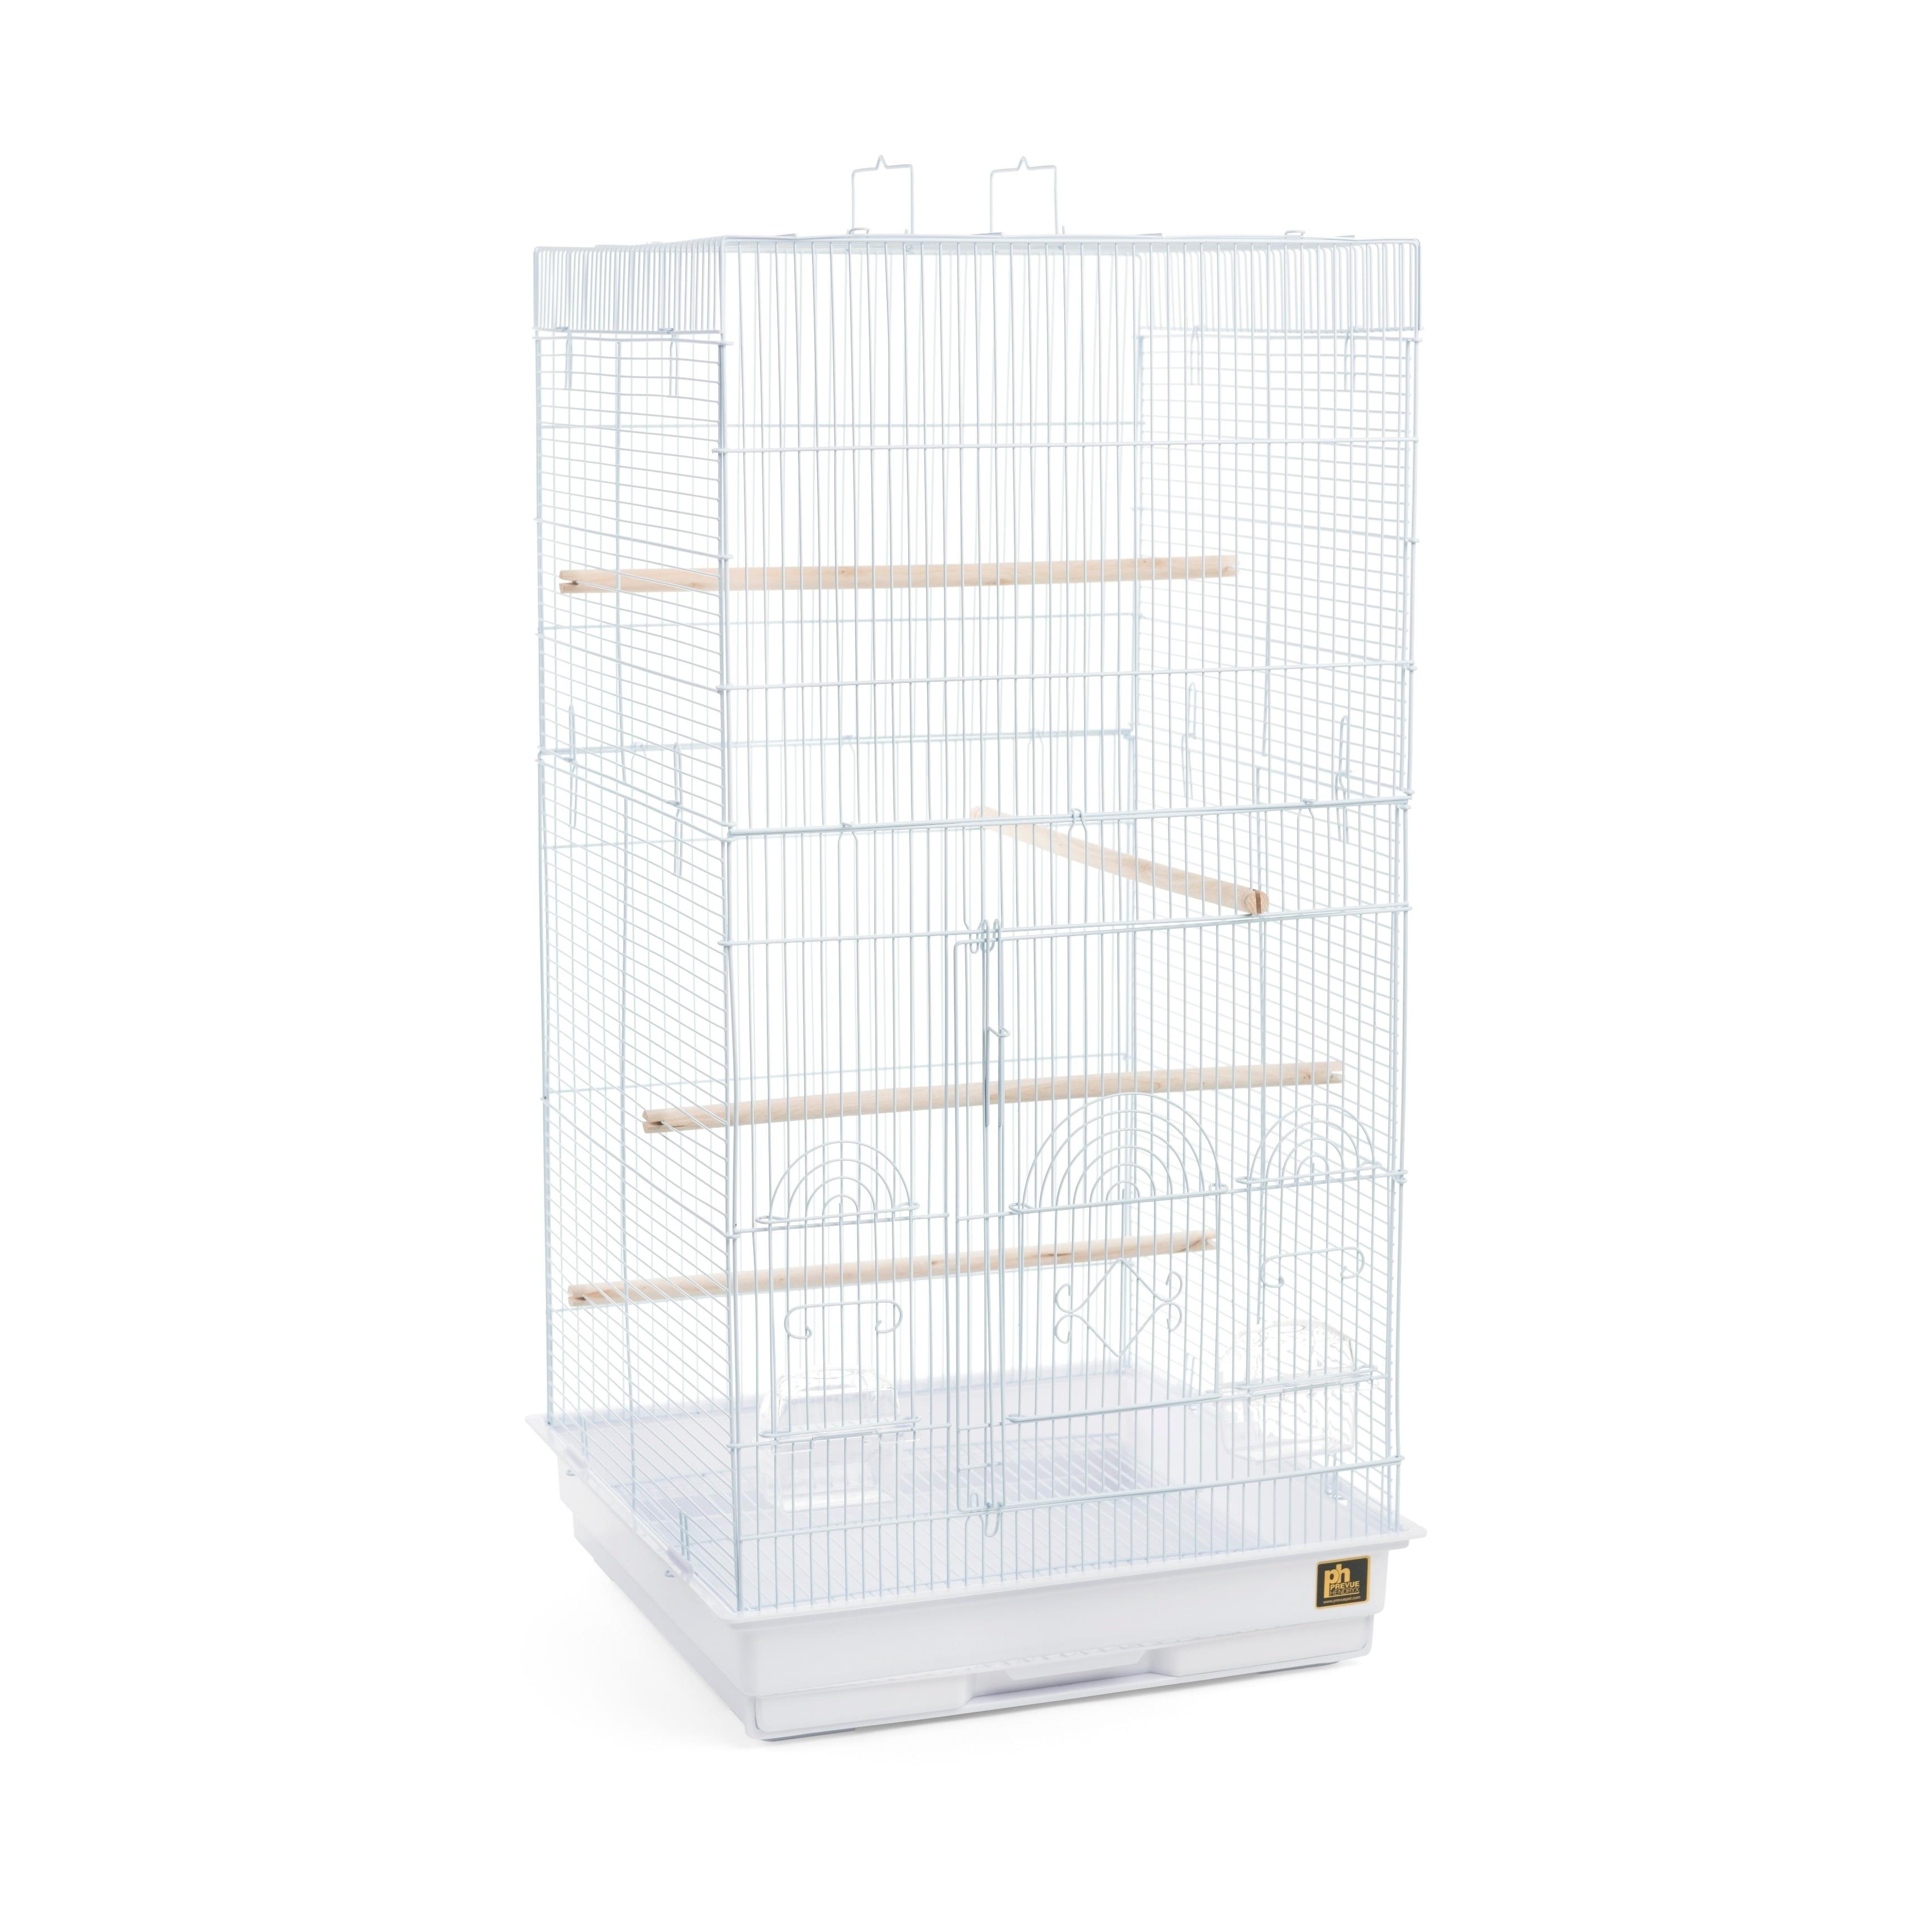 Prevue Pet Products Tall Tiel Small-Medium Bird Cage (White)